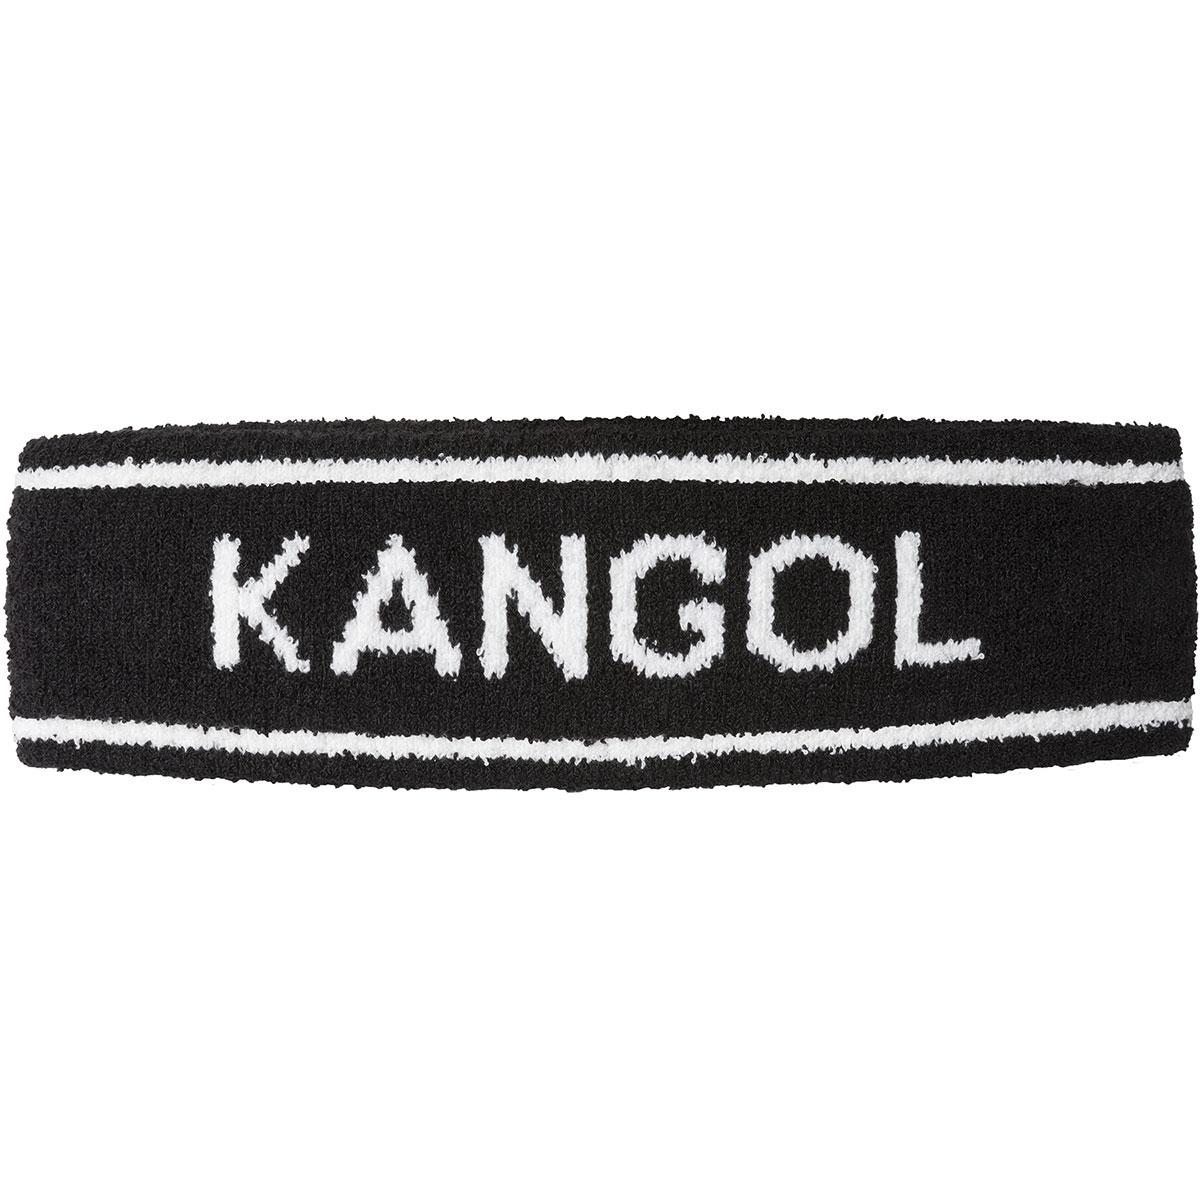 Kangol Bermuda Stripe Headband in Black